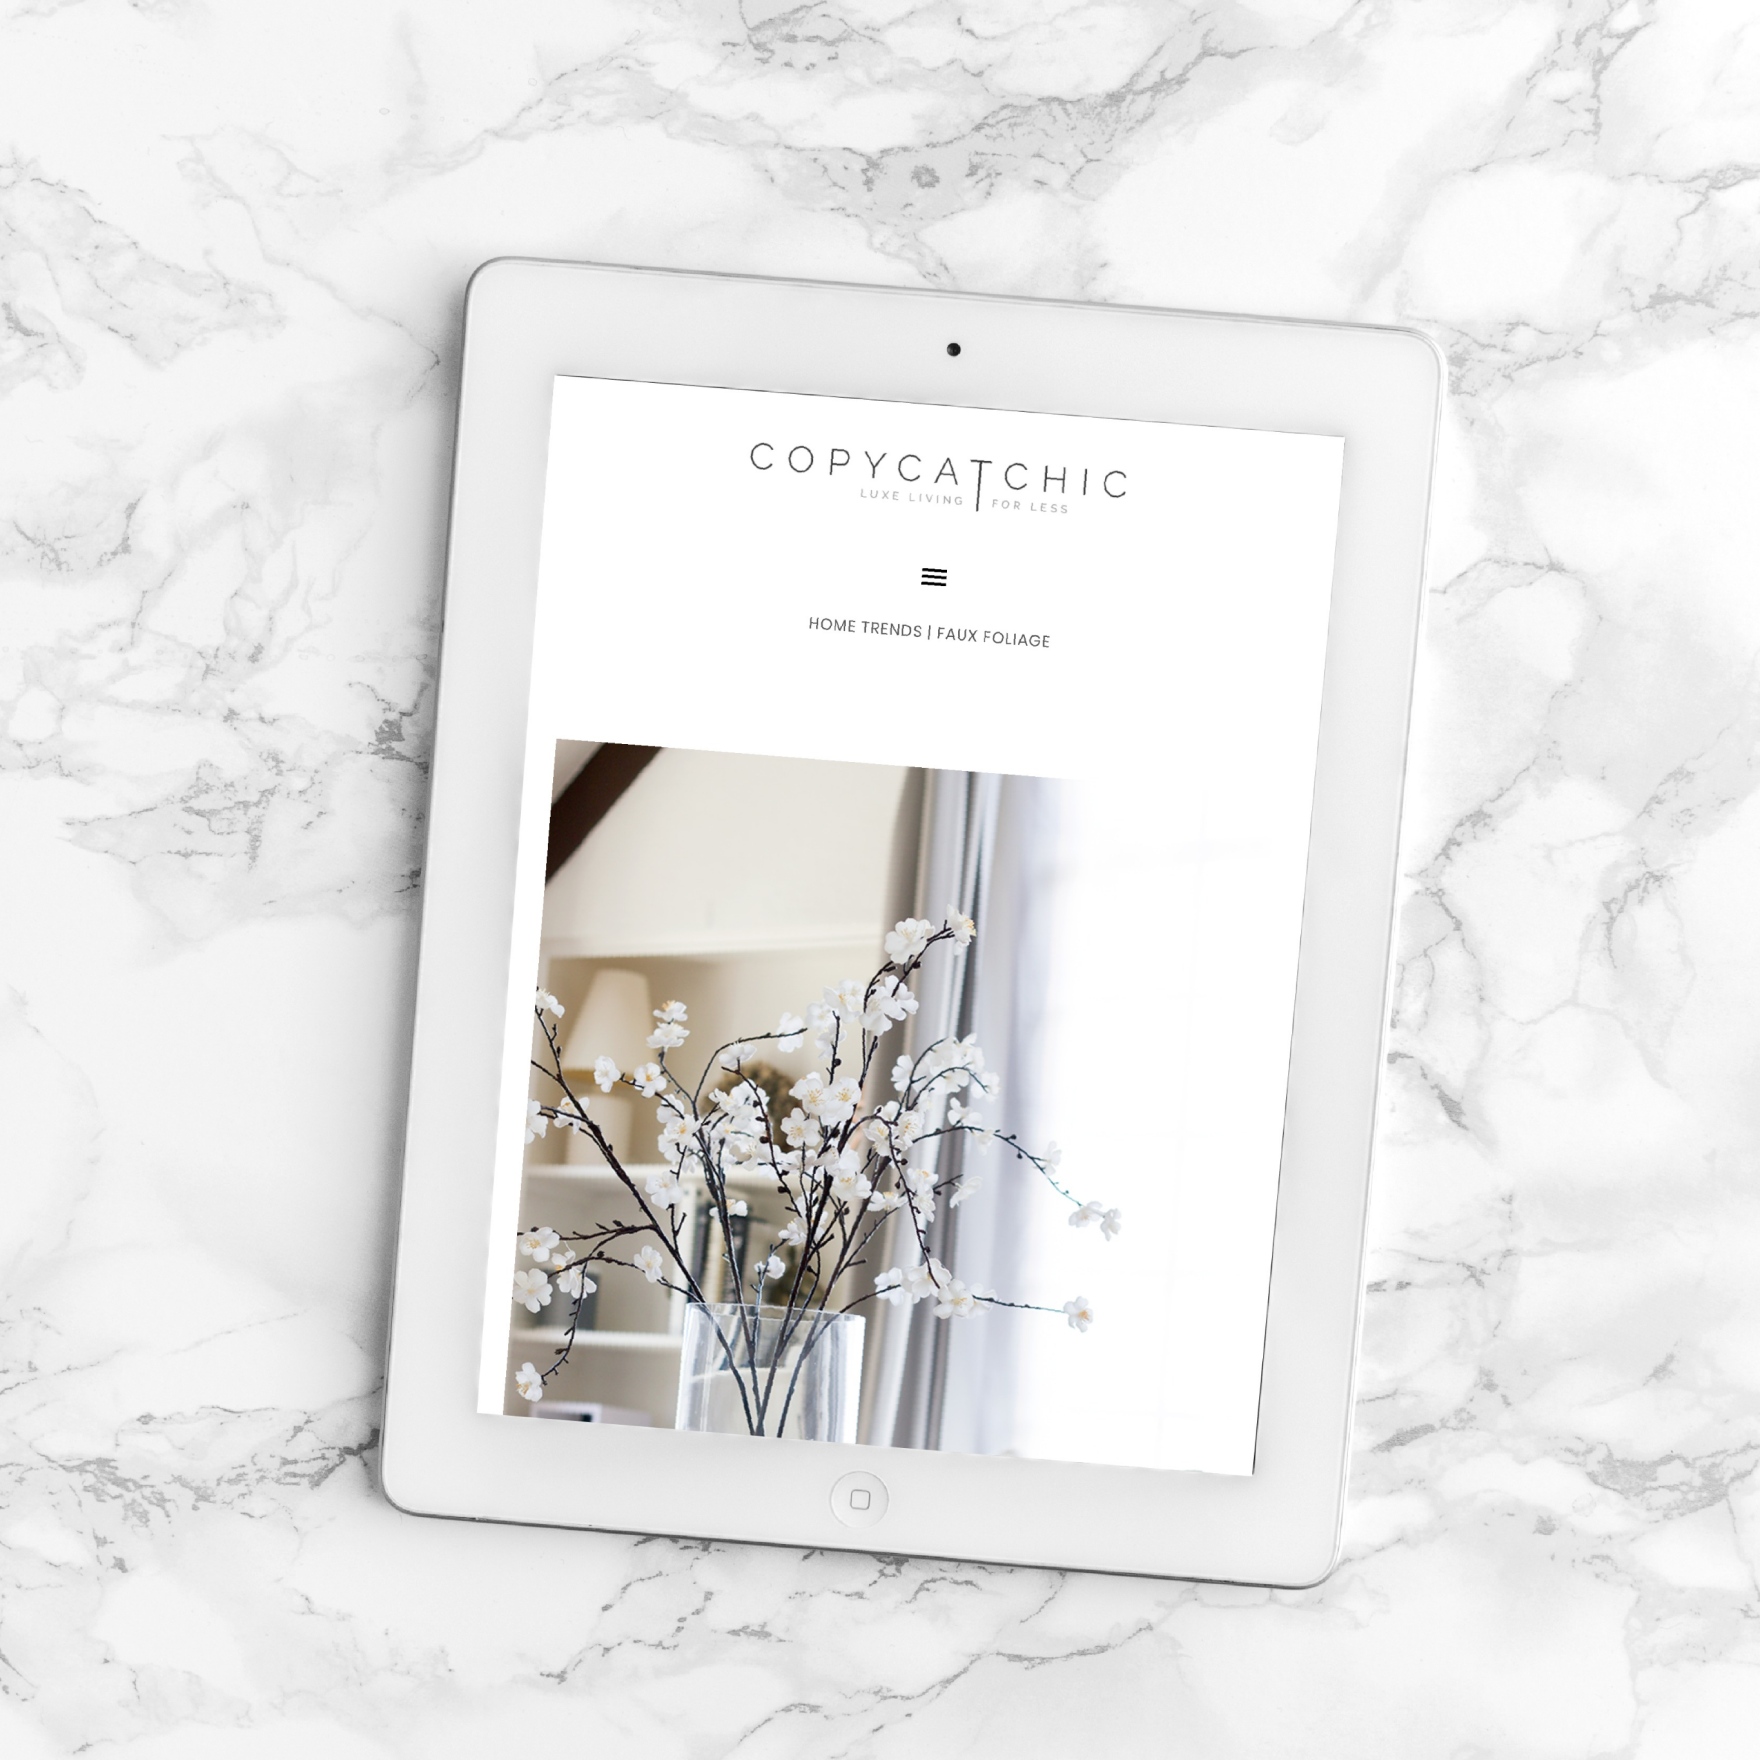 CopyCatChic Website and Ecommerce Interior Design